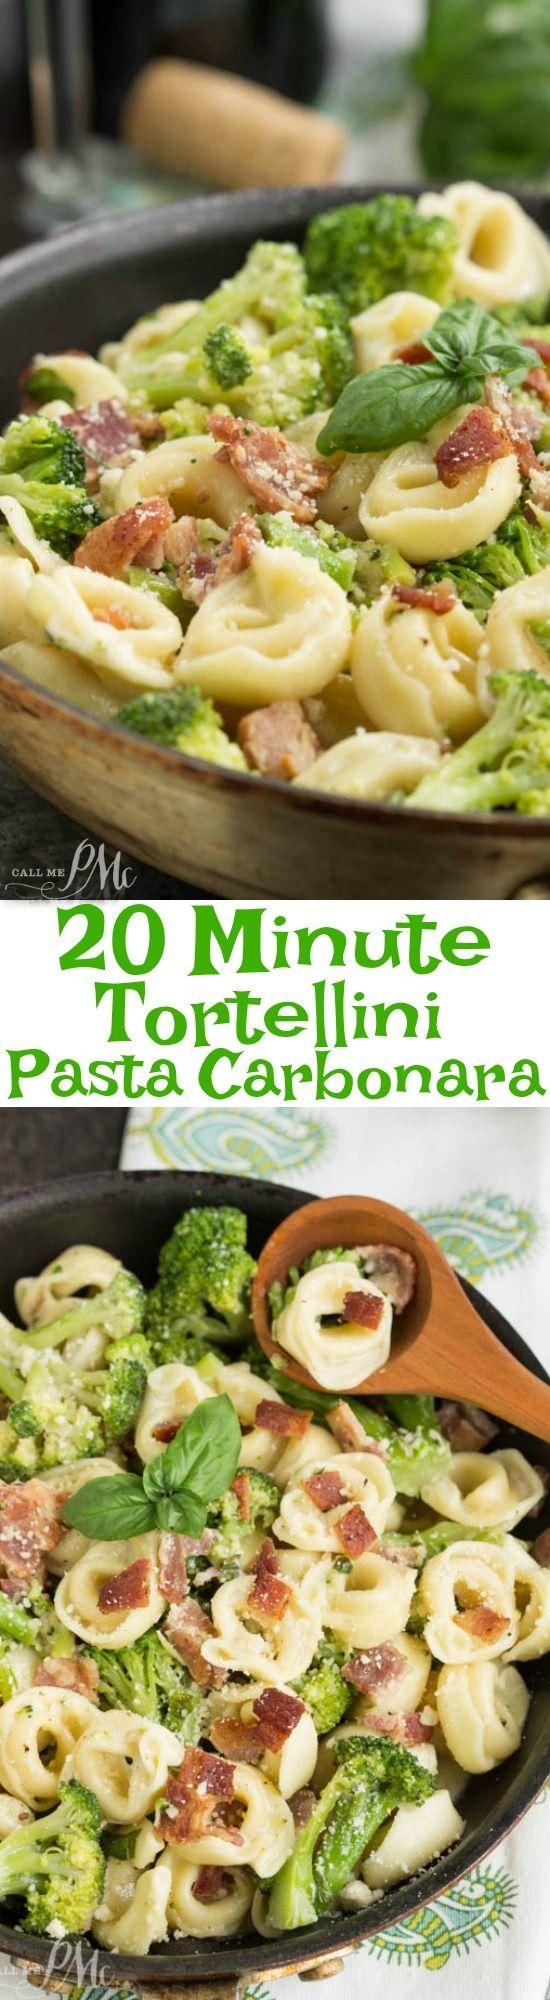 20 Minute Tortellini Pasta Carbonara http://www.callmepmc.com/20-minute-tortellini-pasta-carbonara/?utm_campaign=coschedule&utm_source=pinterest&utm_medium=Paula%20%7C%20CallMePMc.com&utm_content=20%20Minute%20Tortellini%20Pasta%20Carbonara